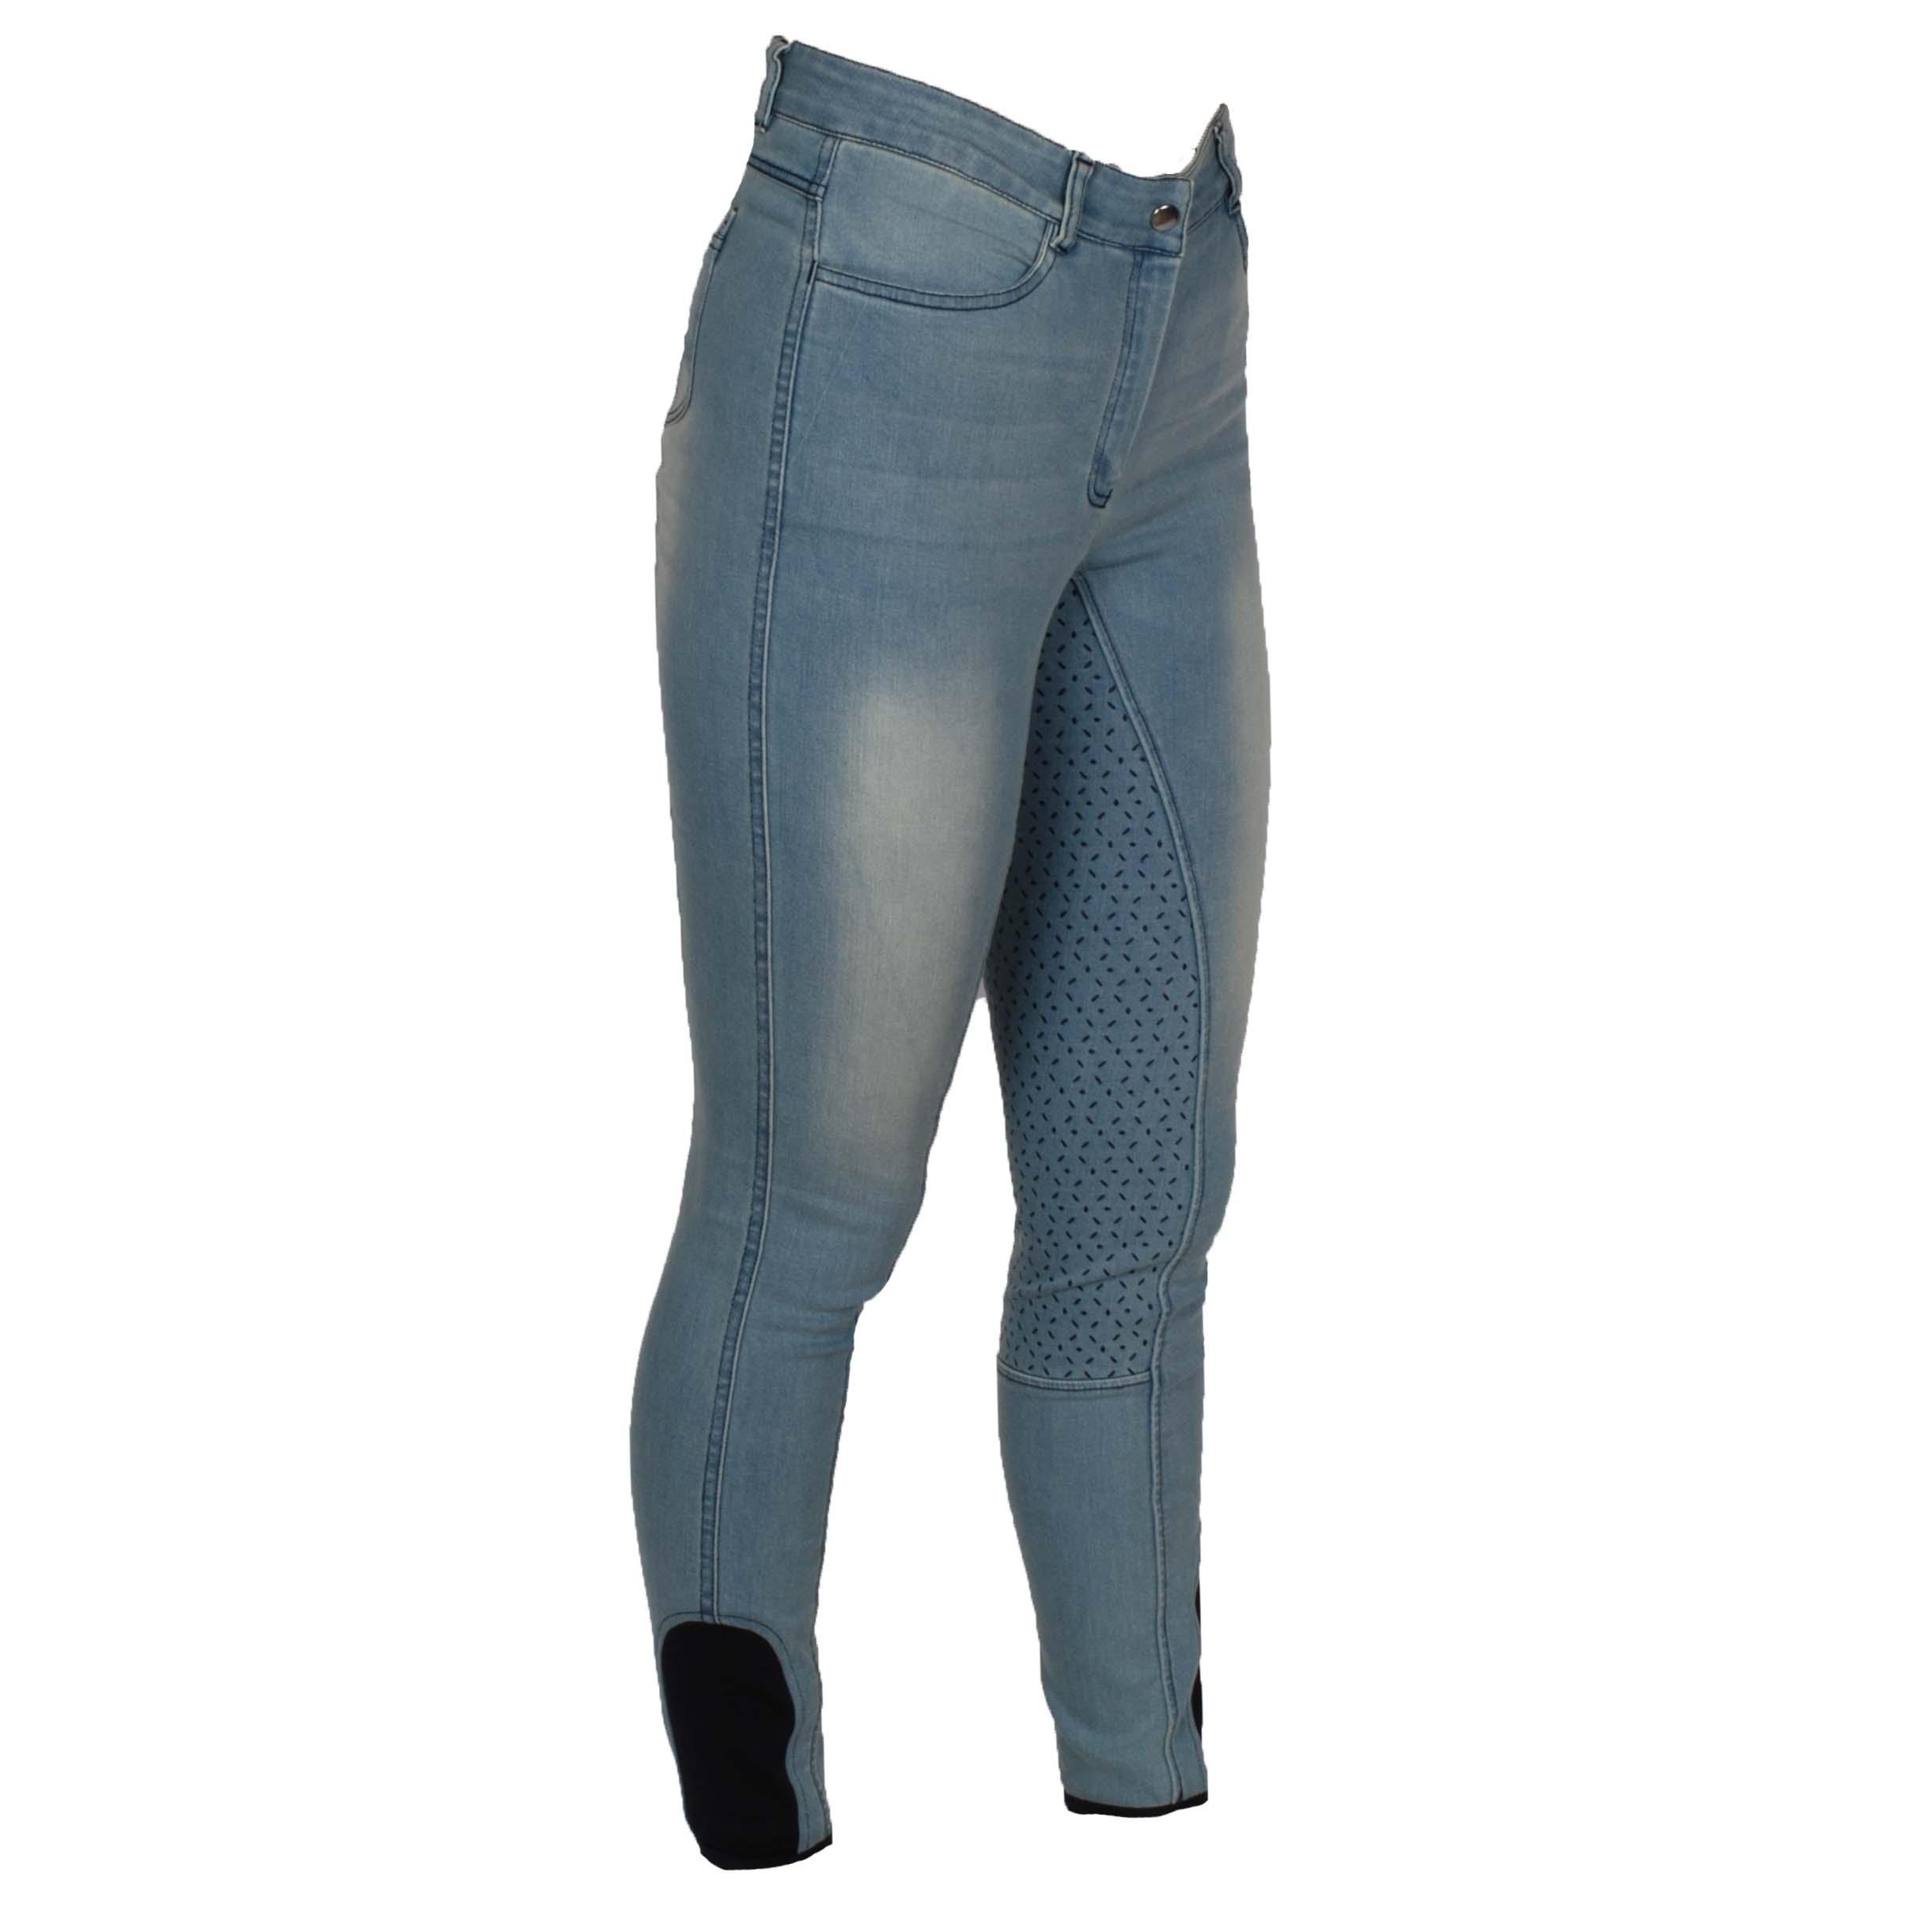 Mondoni Bellville jeans FG rijbroek jeans maat:40